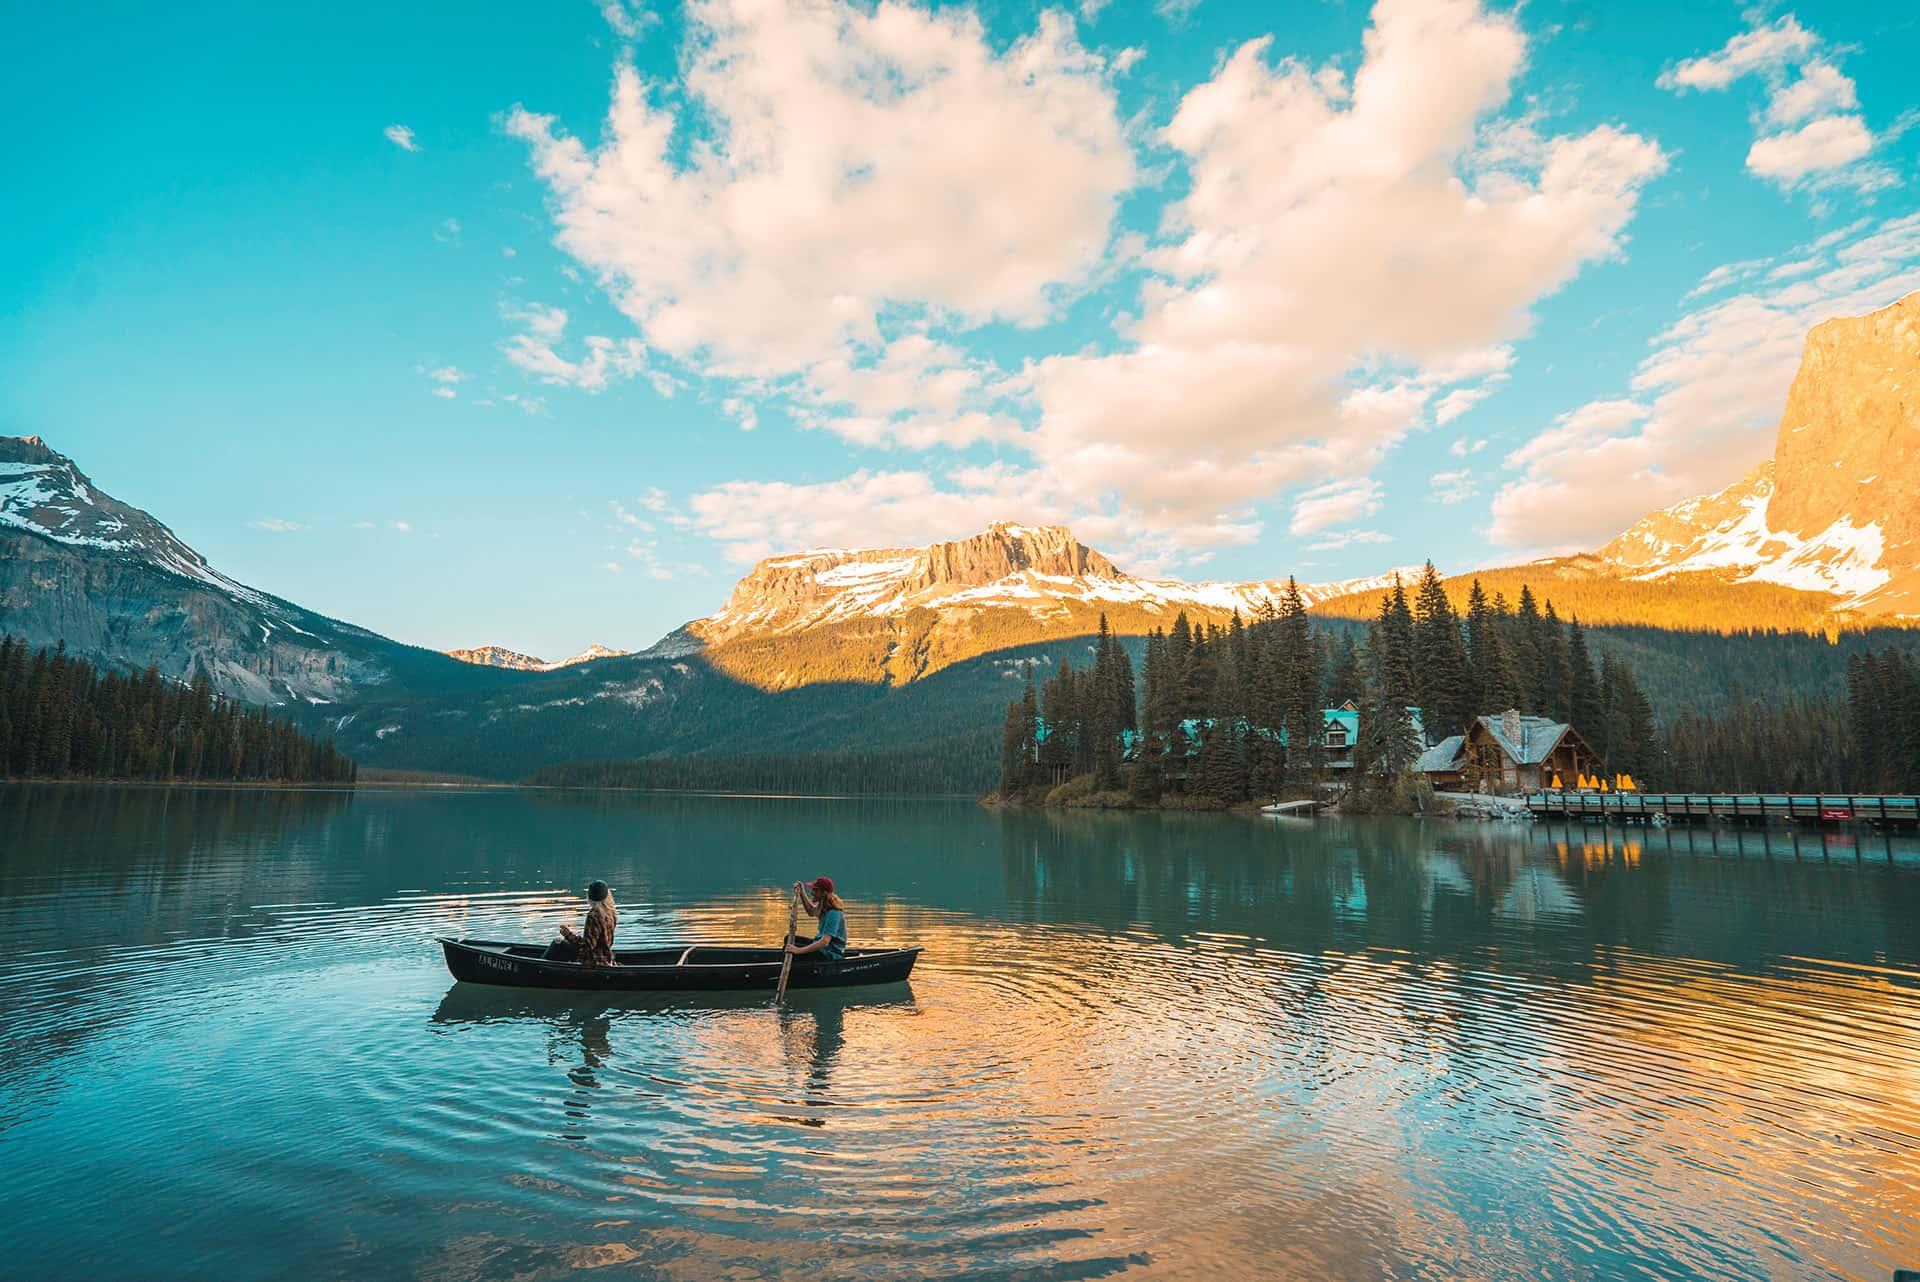 Canoeing in Emerald Lake at Yoho National Park